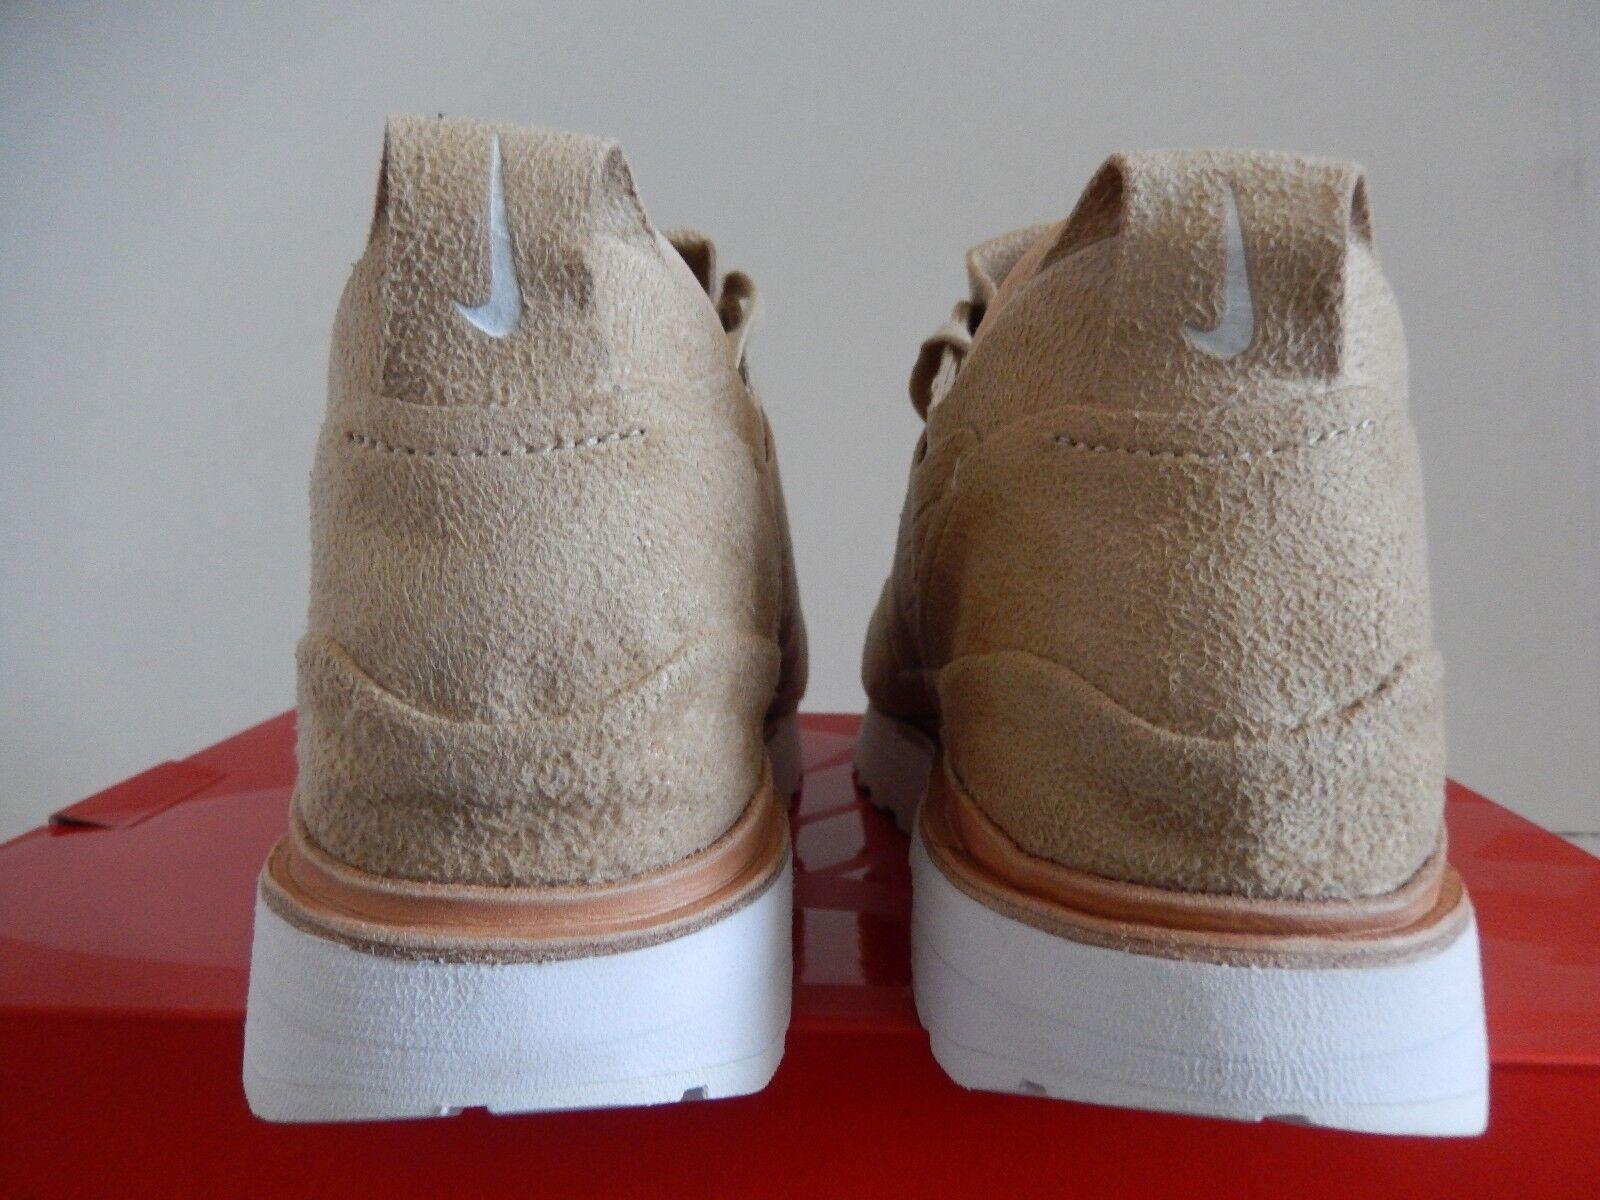 Nike air max 1 royal linen-summit white sz 847671-221] 9,5 847671-221] sz 6c4eb5